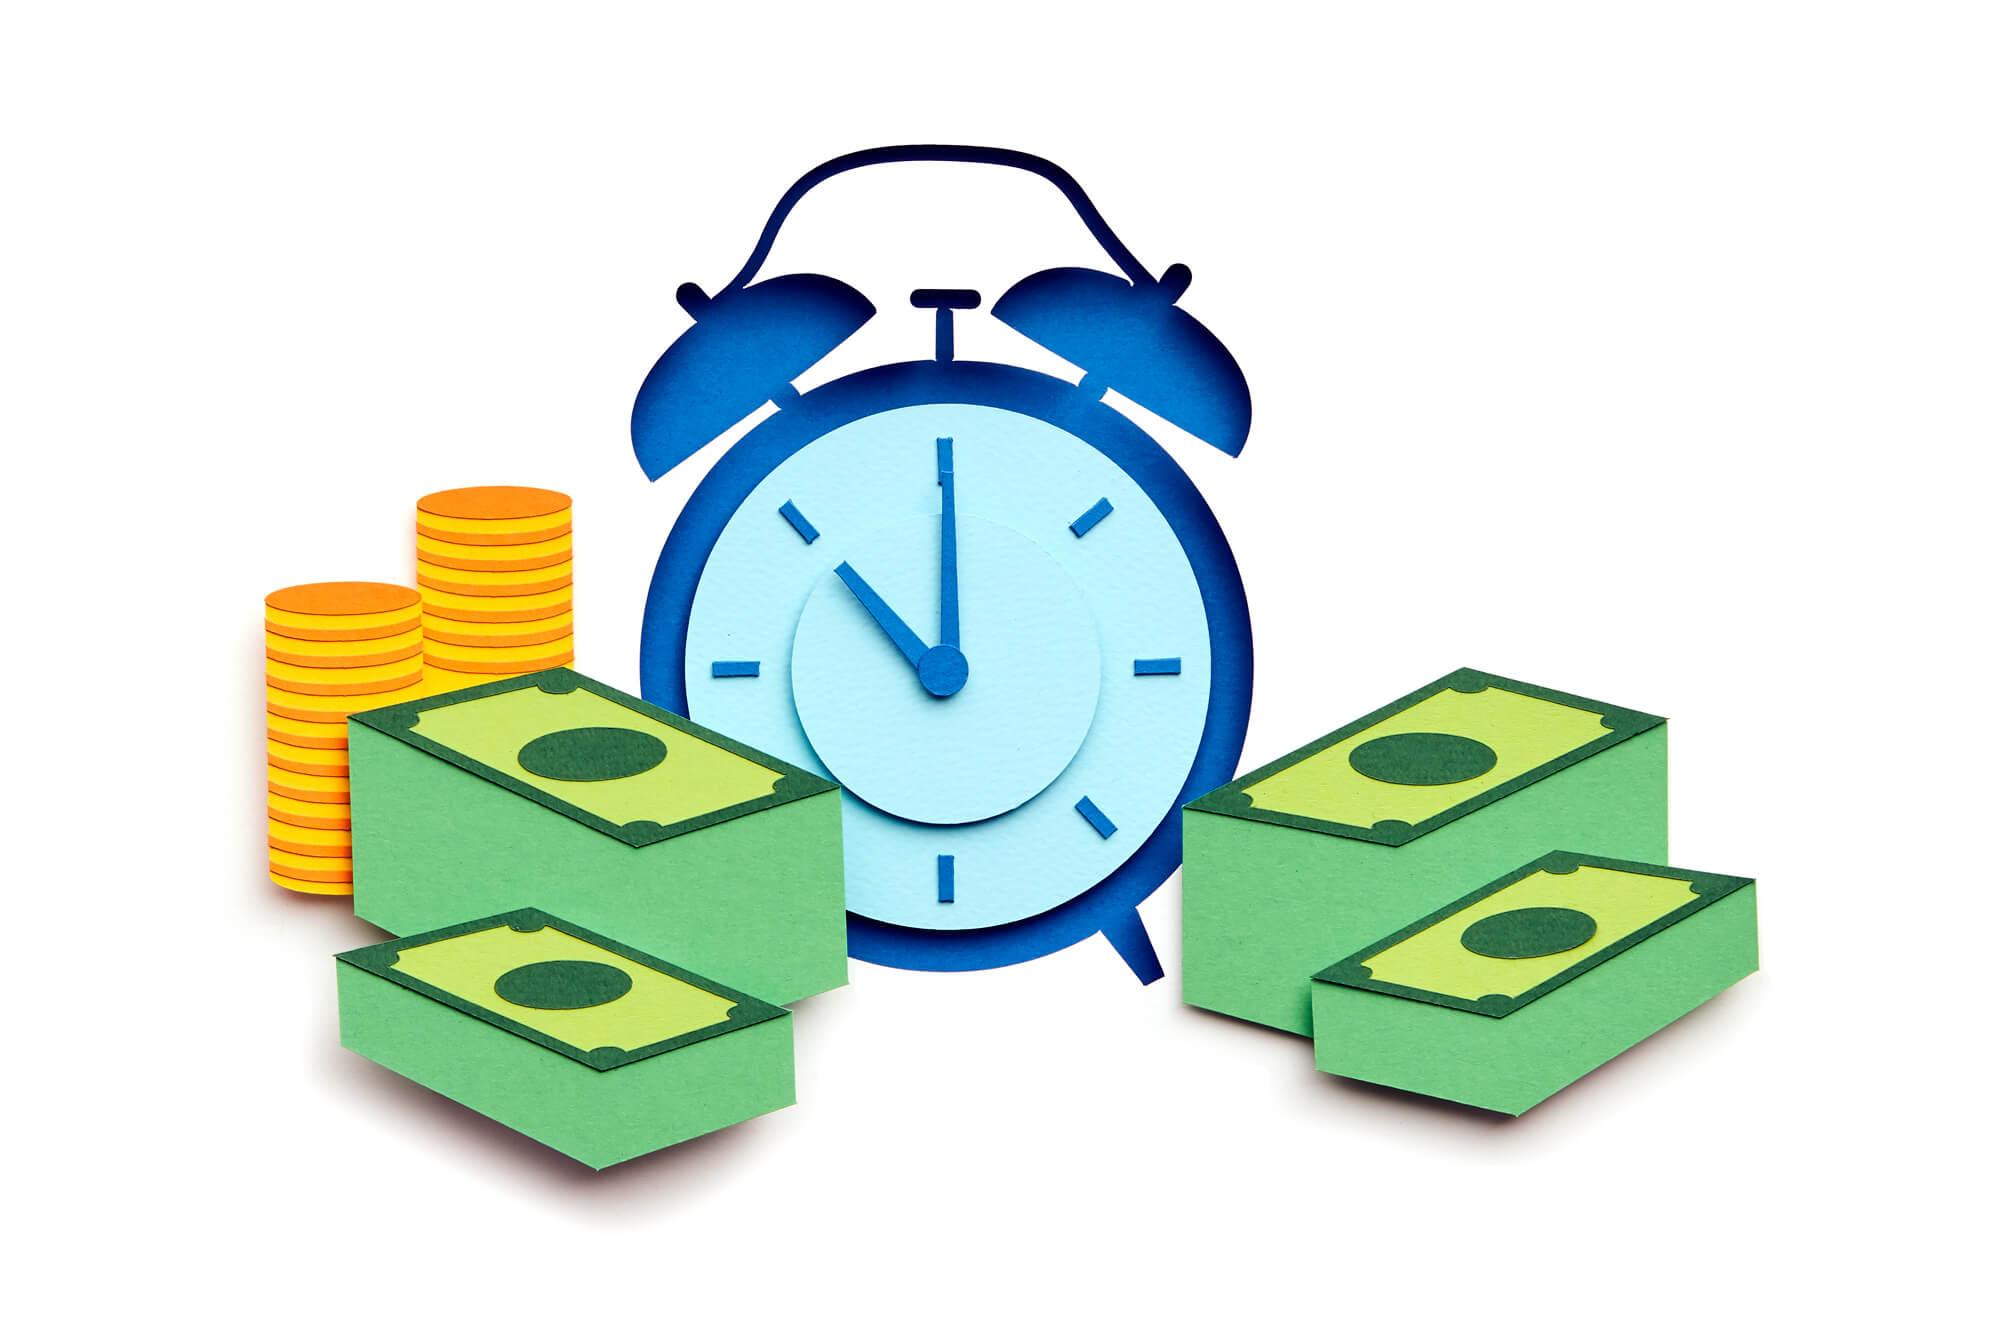 score_Synchronybank_paperart_katrinrodegast_clock